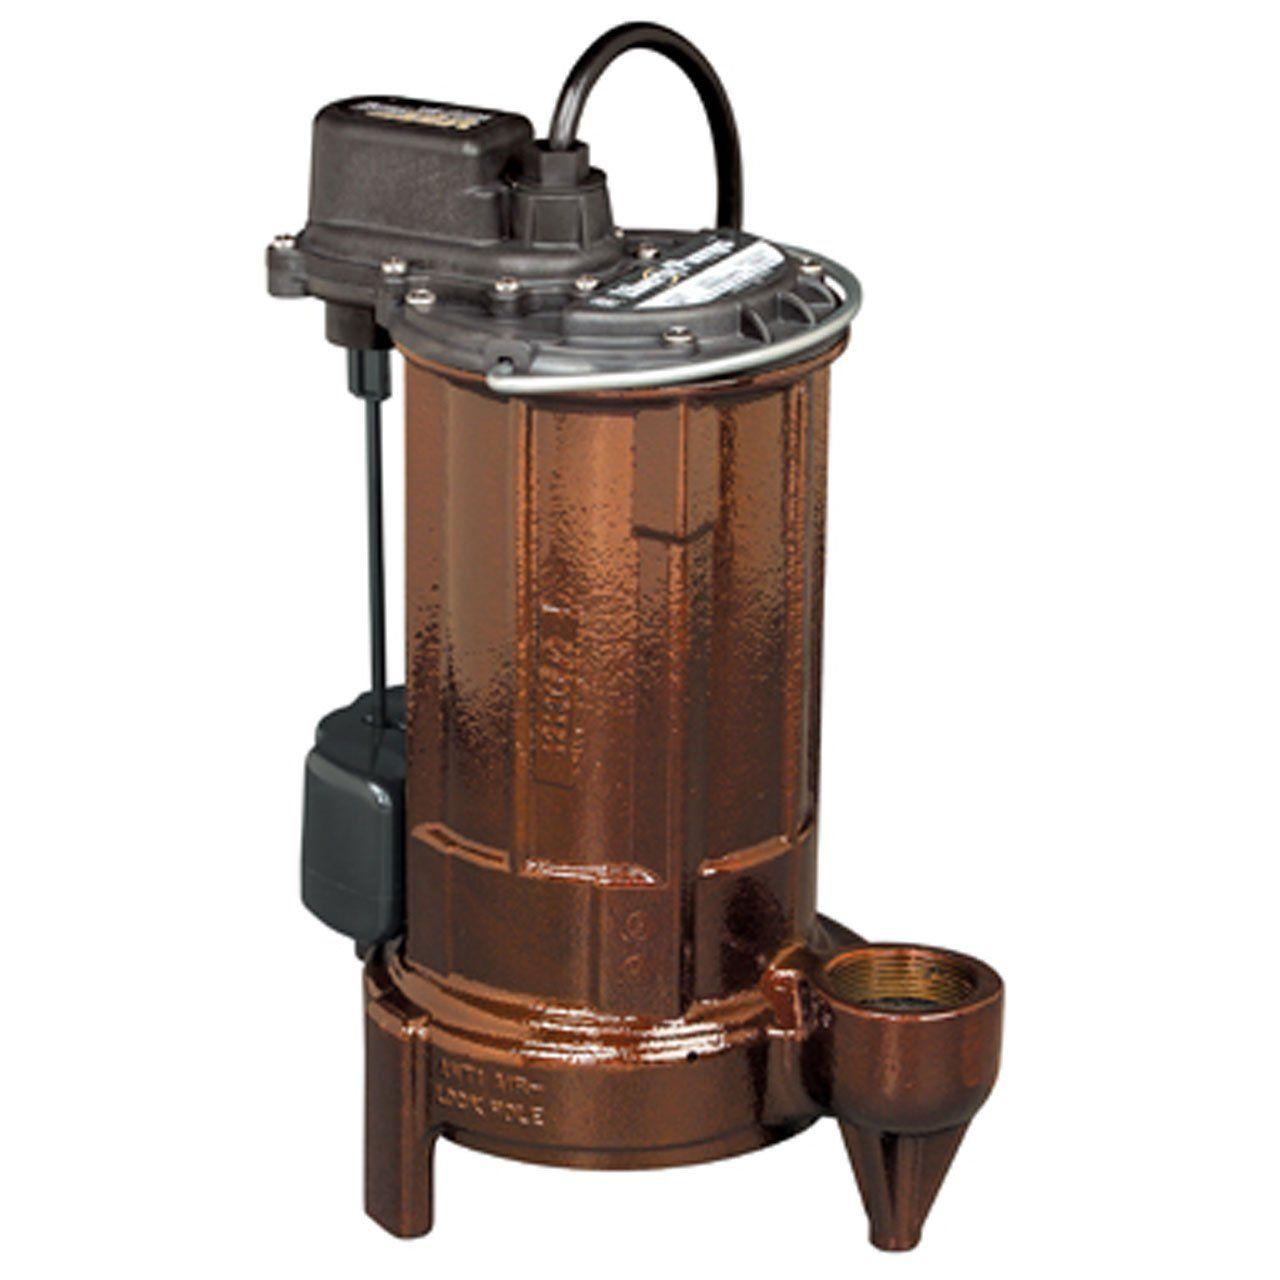 Liberty Pumps 287 2 Vertical Magnetic Float 1 2 Hp Mid Range Head Submersible Sump Effluent Pump With Series Plug Effluent Pump Submersible Sump Pump Sump Pump